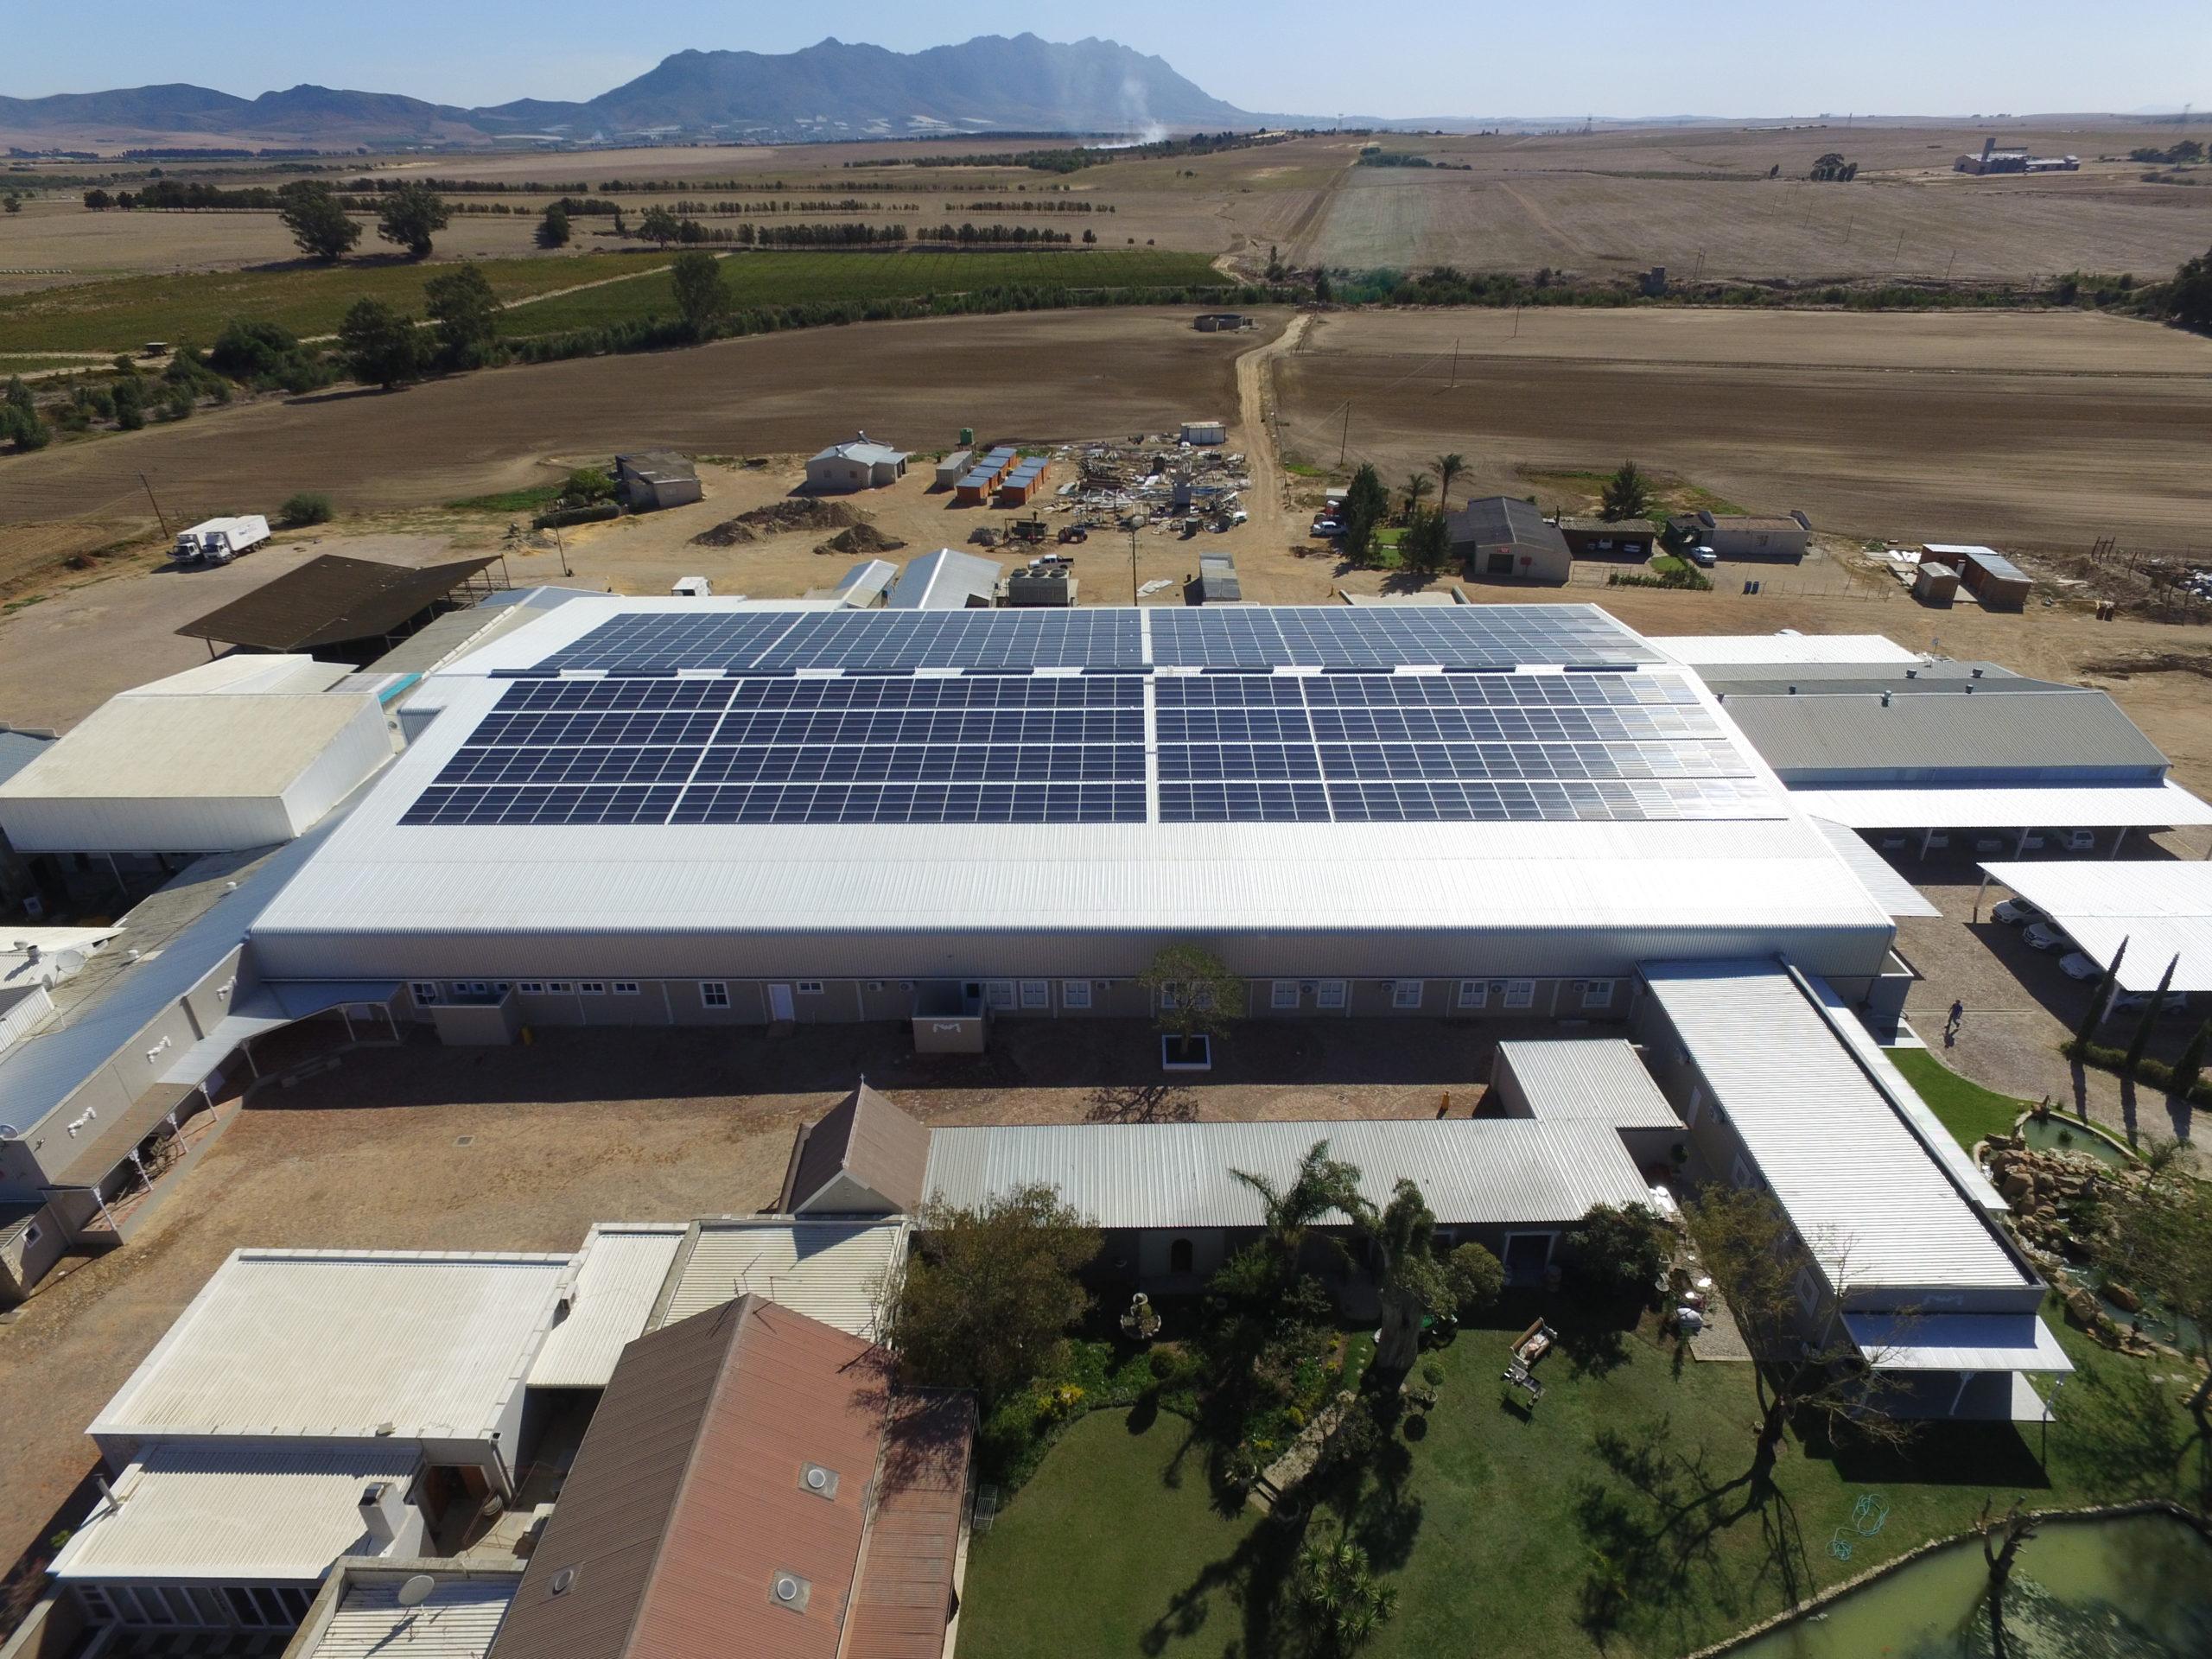 Tomis solar power initiative